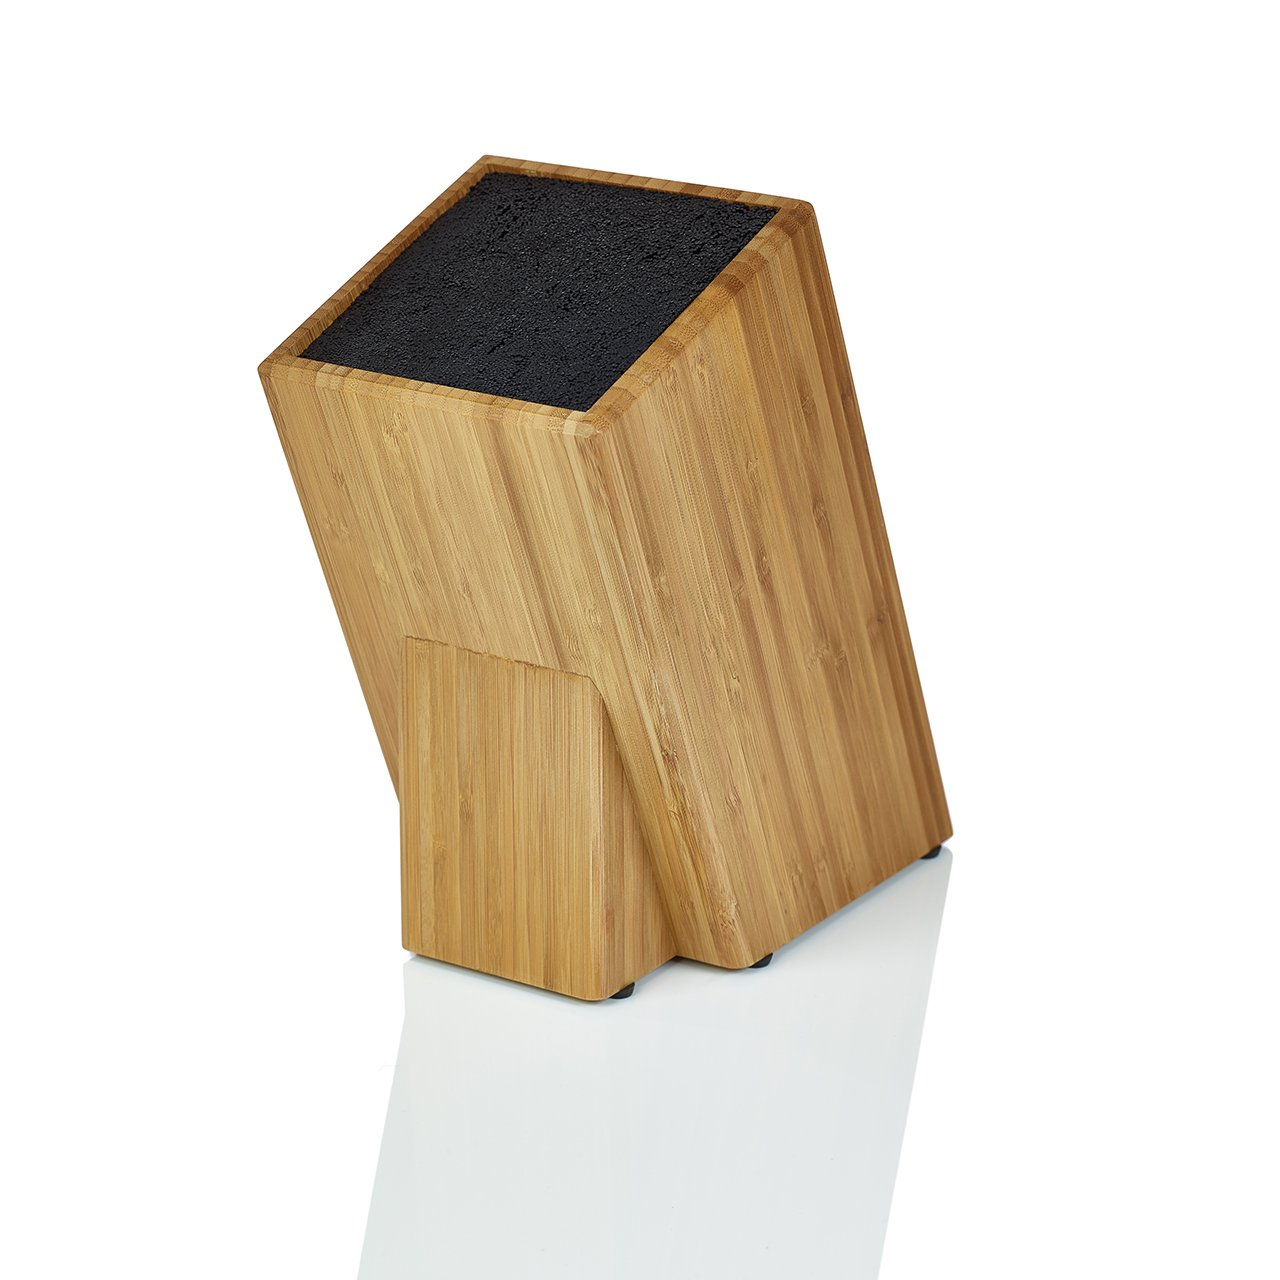 Kapoosh Dice Knife Block, Bamboo Wood